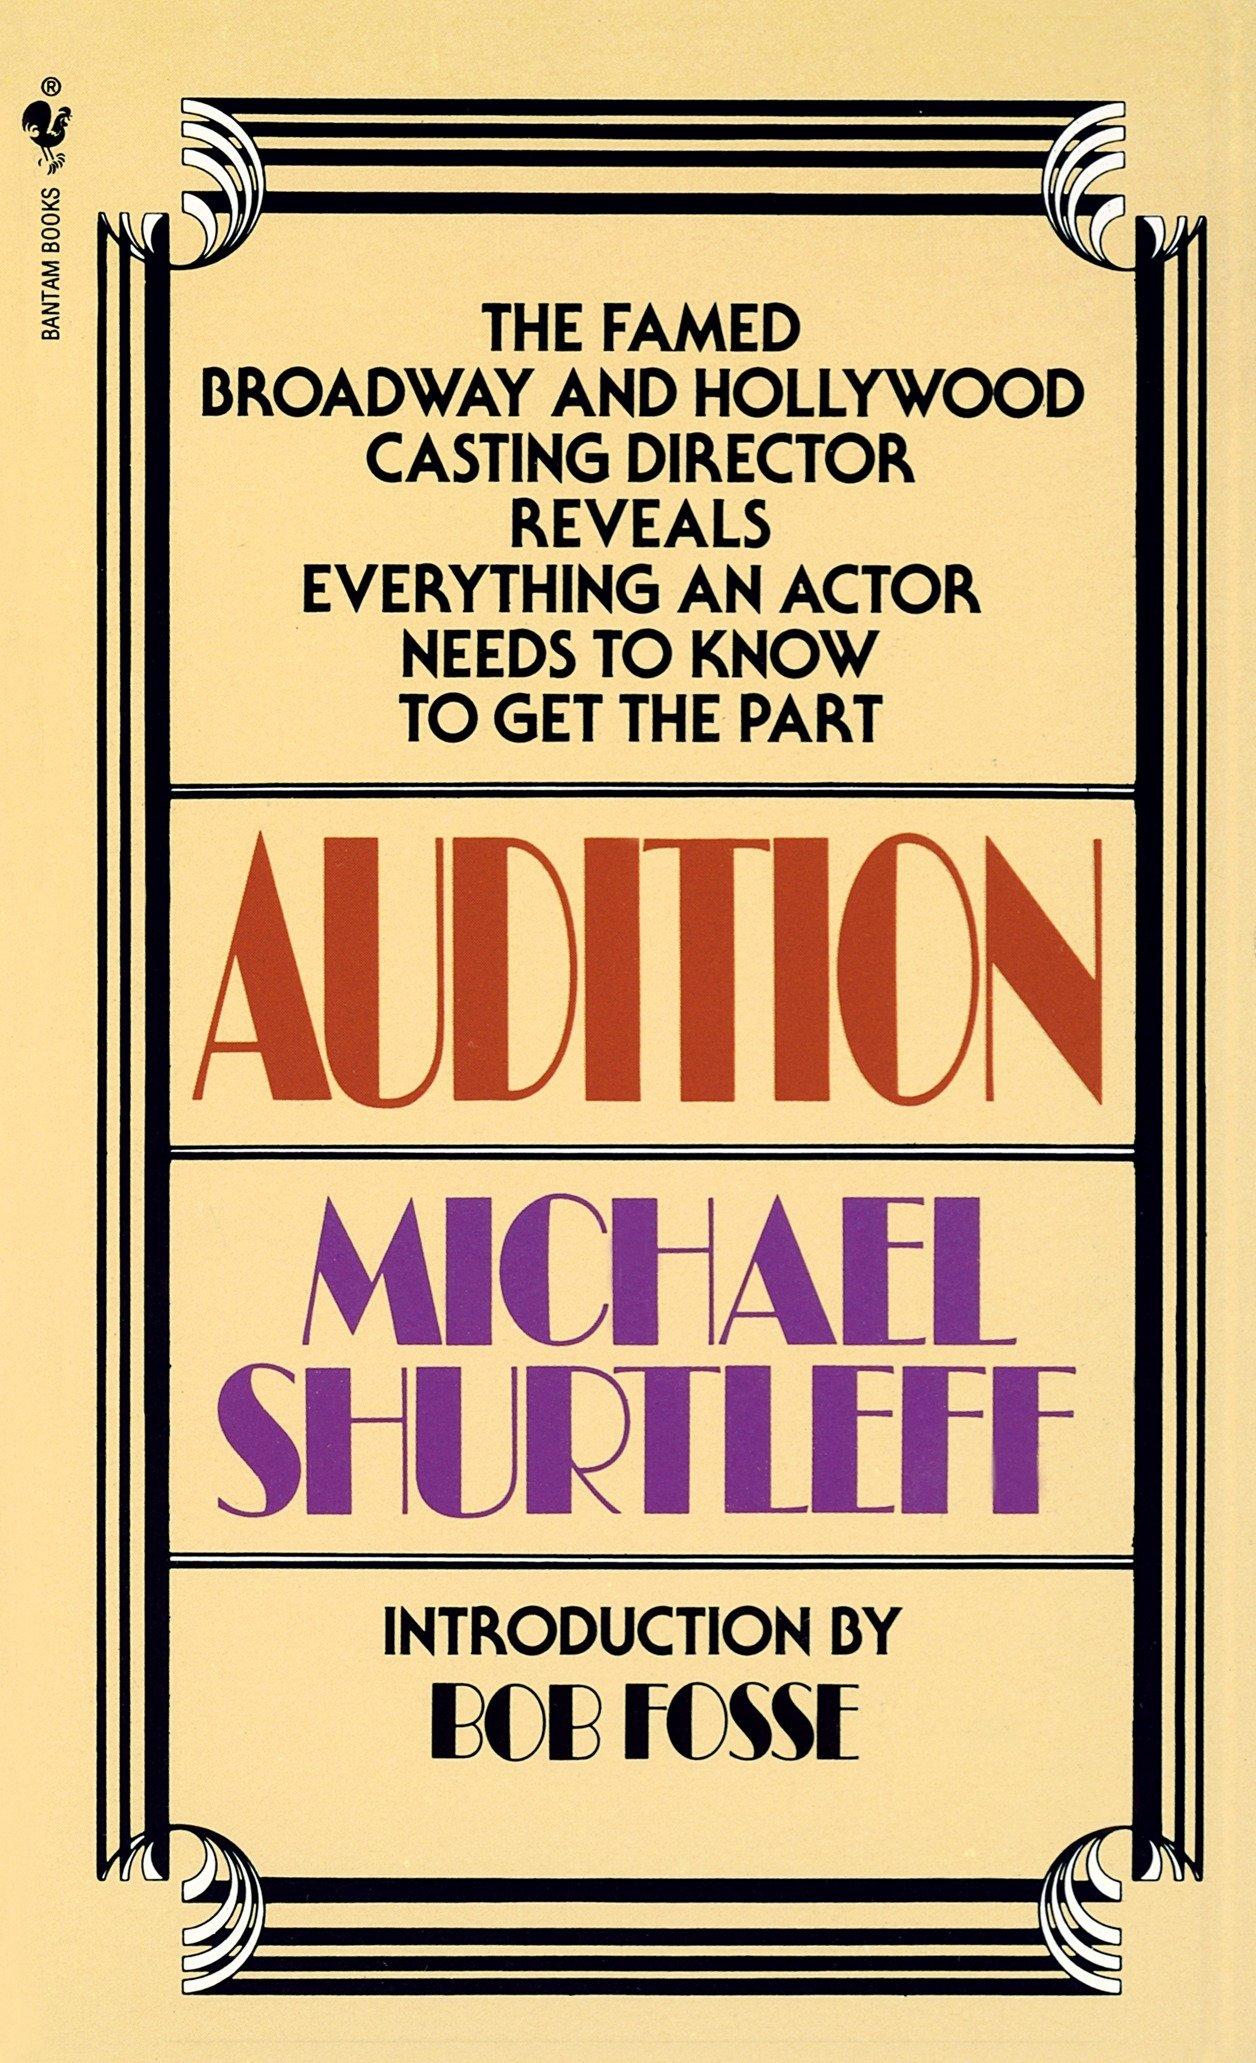 Audition, Michael Shurtleff